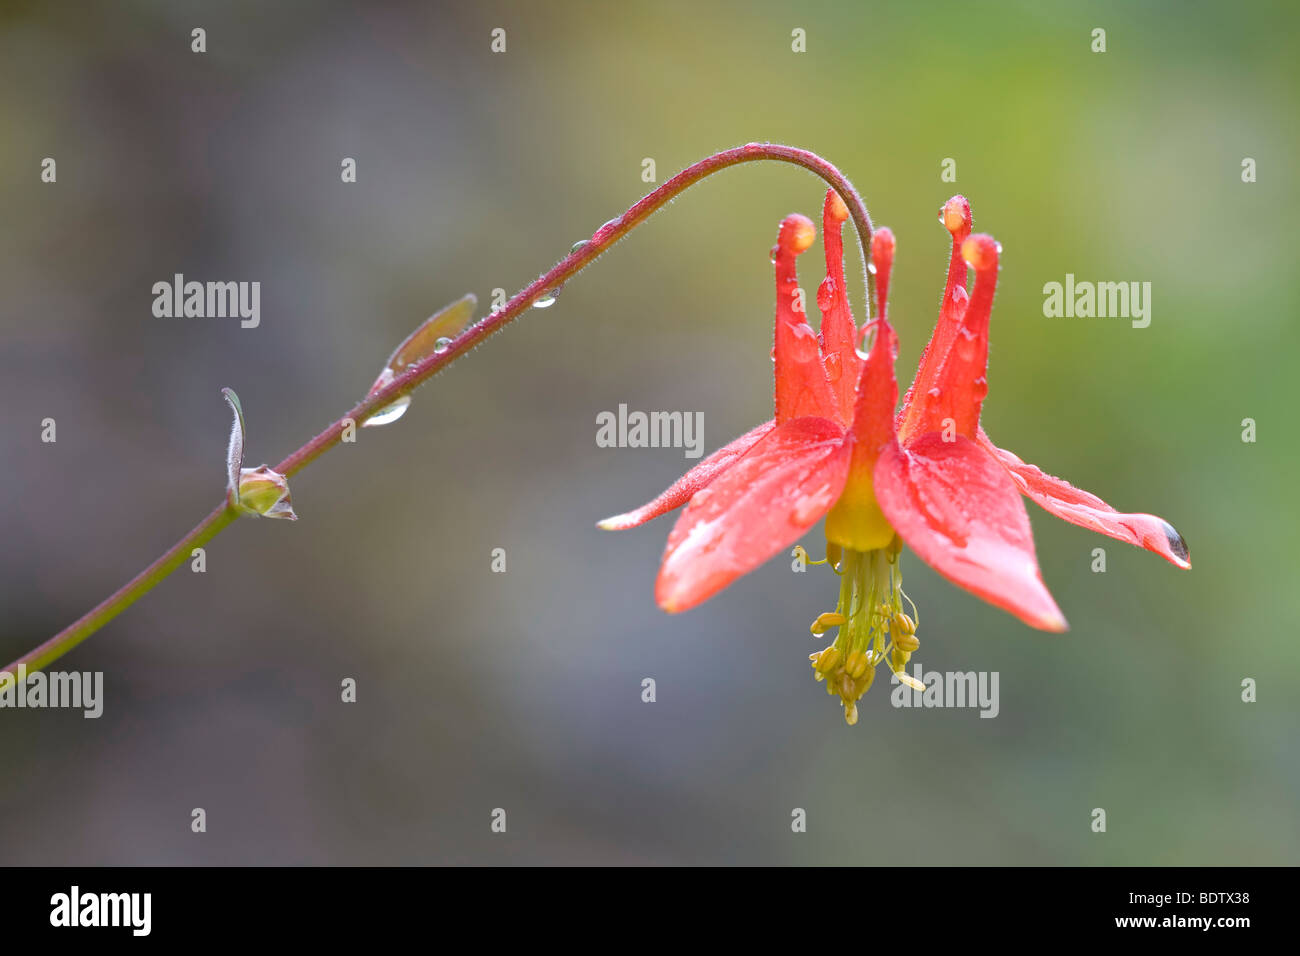 Karmesinrote Akelei - (Western-Akelei) / Western Columbine - (Crimson Columbine) / Aquilegia formosa - Stock Image